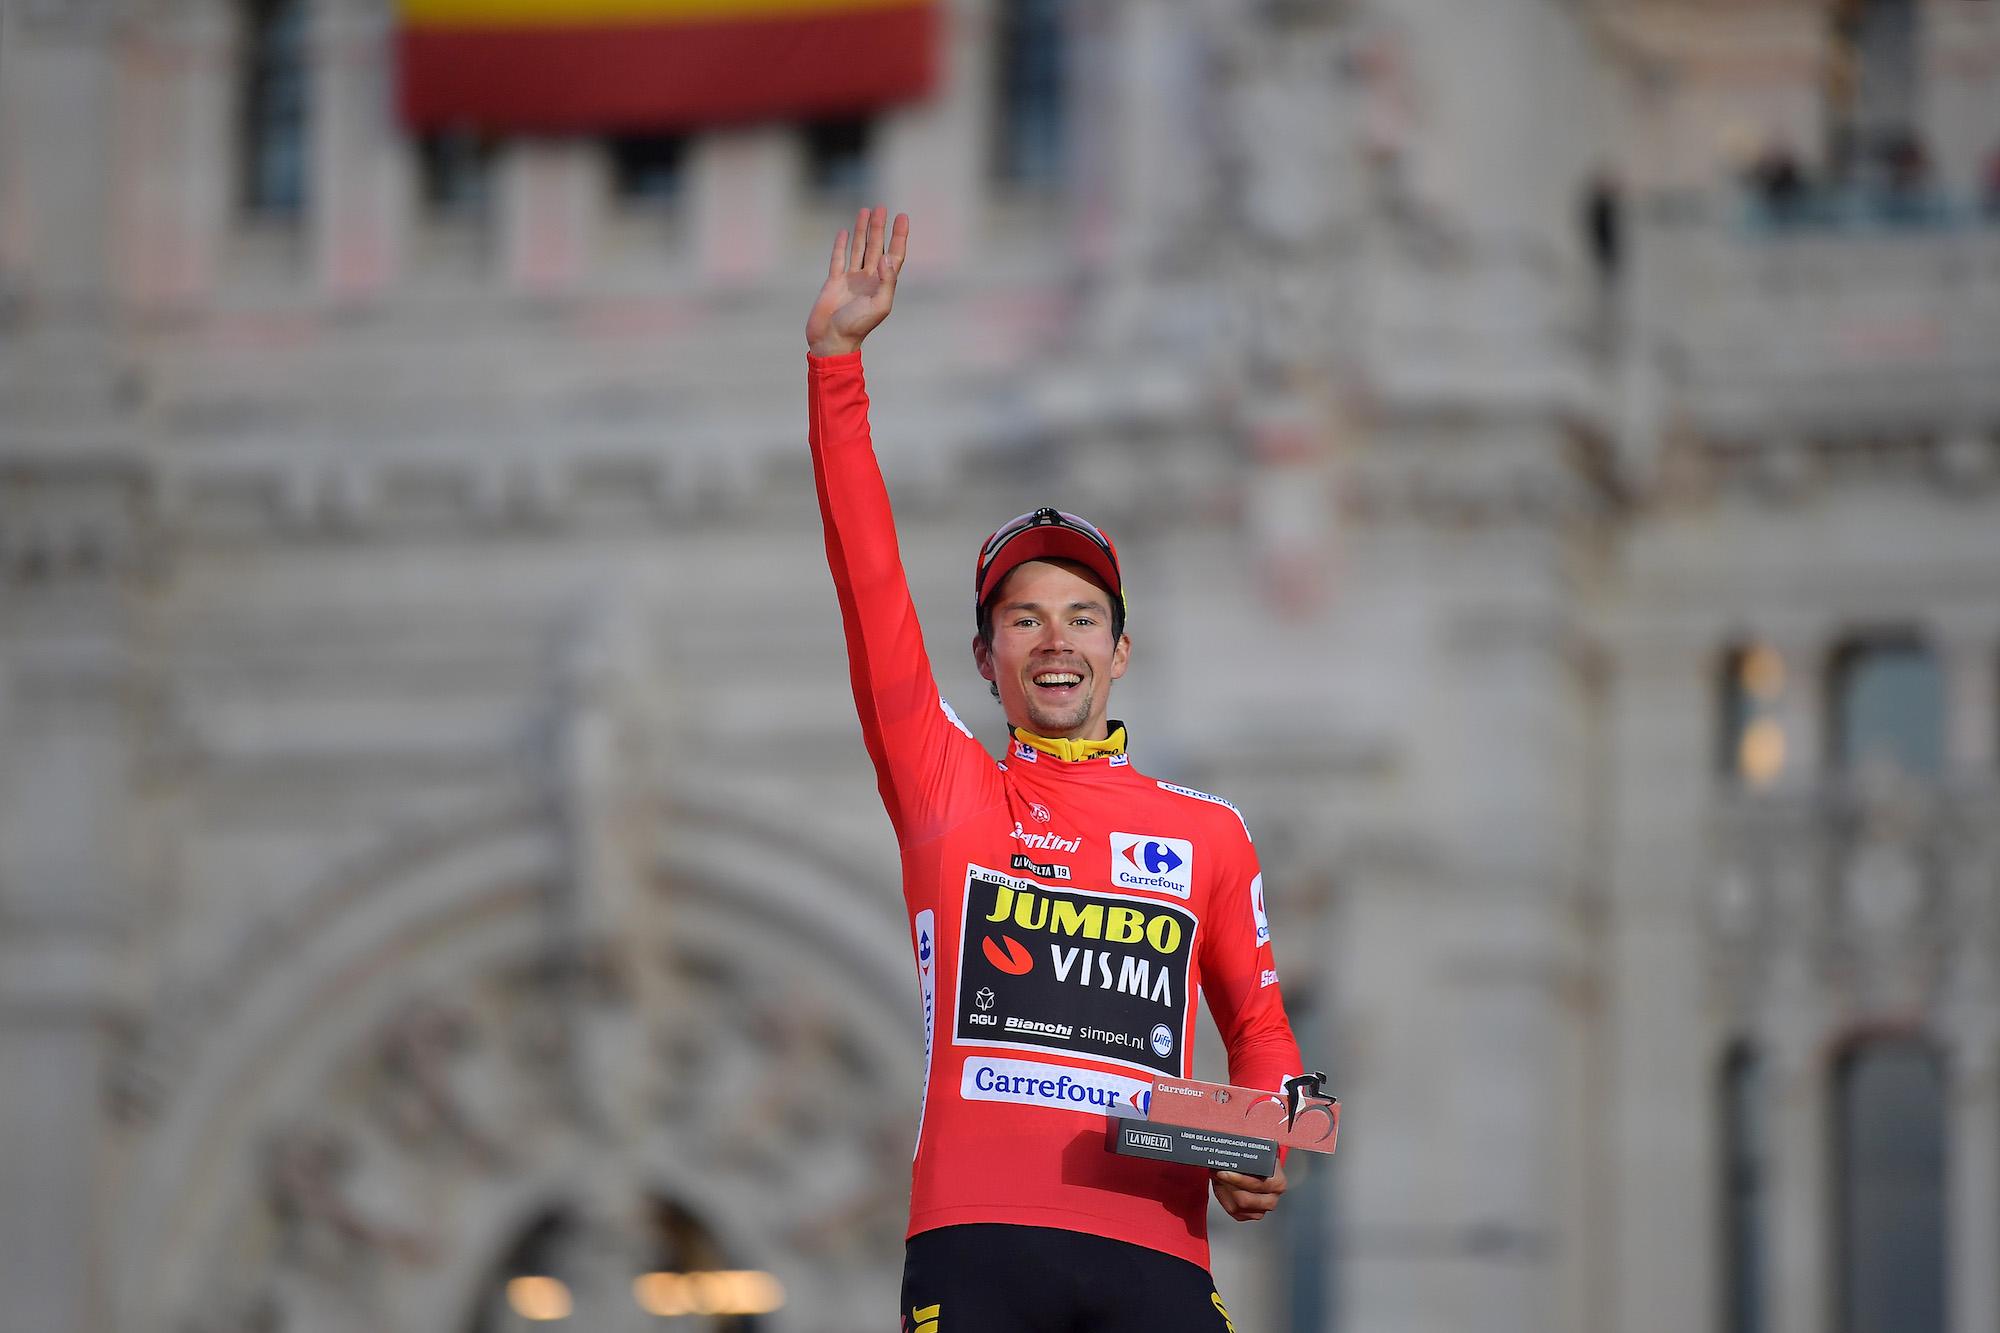 Primož Roglič wins Vuelta a España 2019 as Fabio Jakobsen takes stage 21